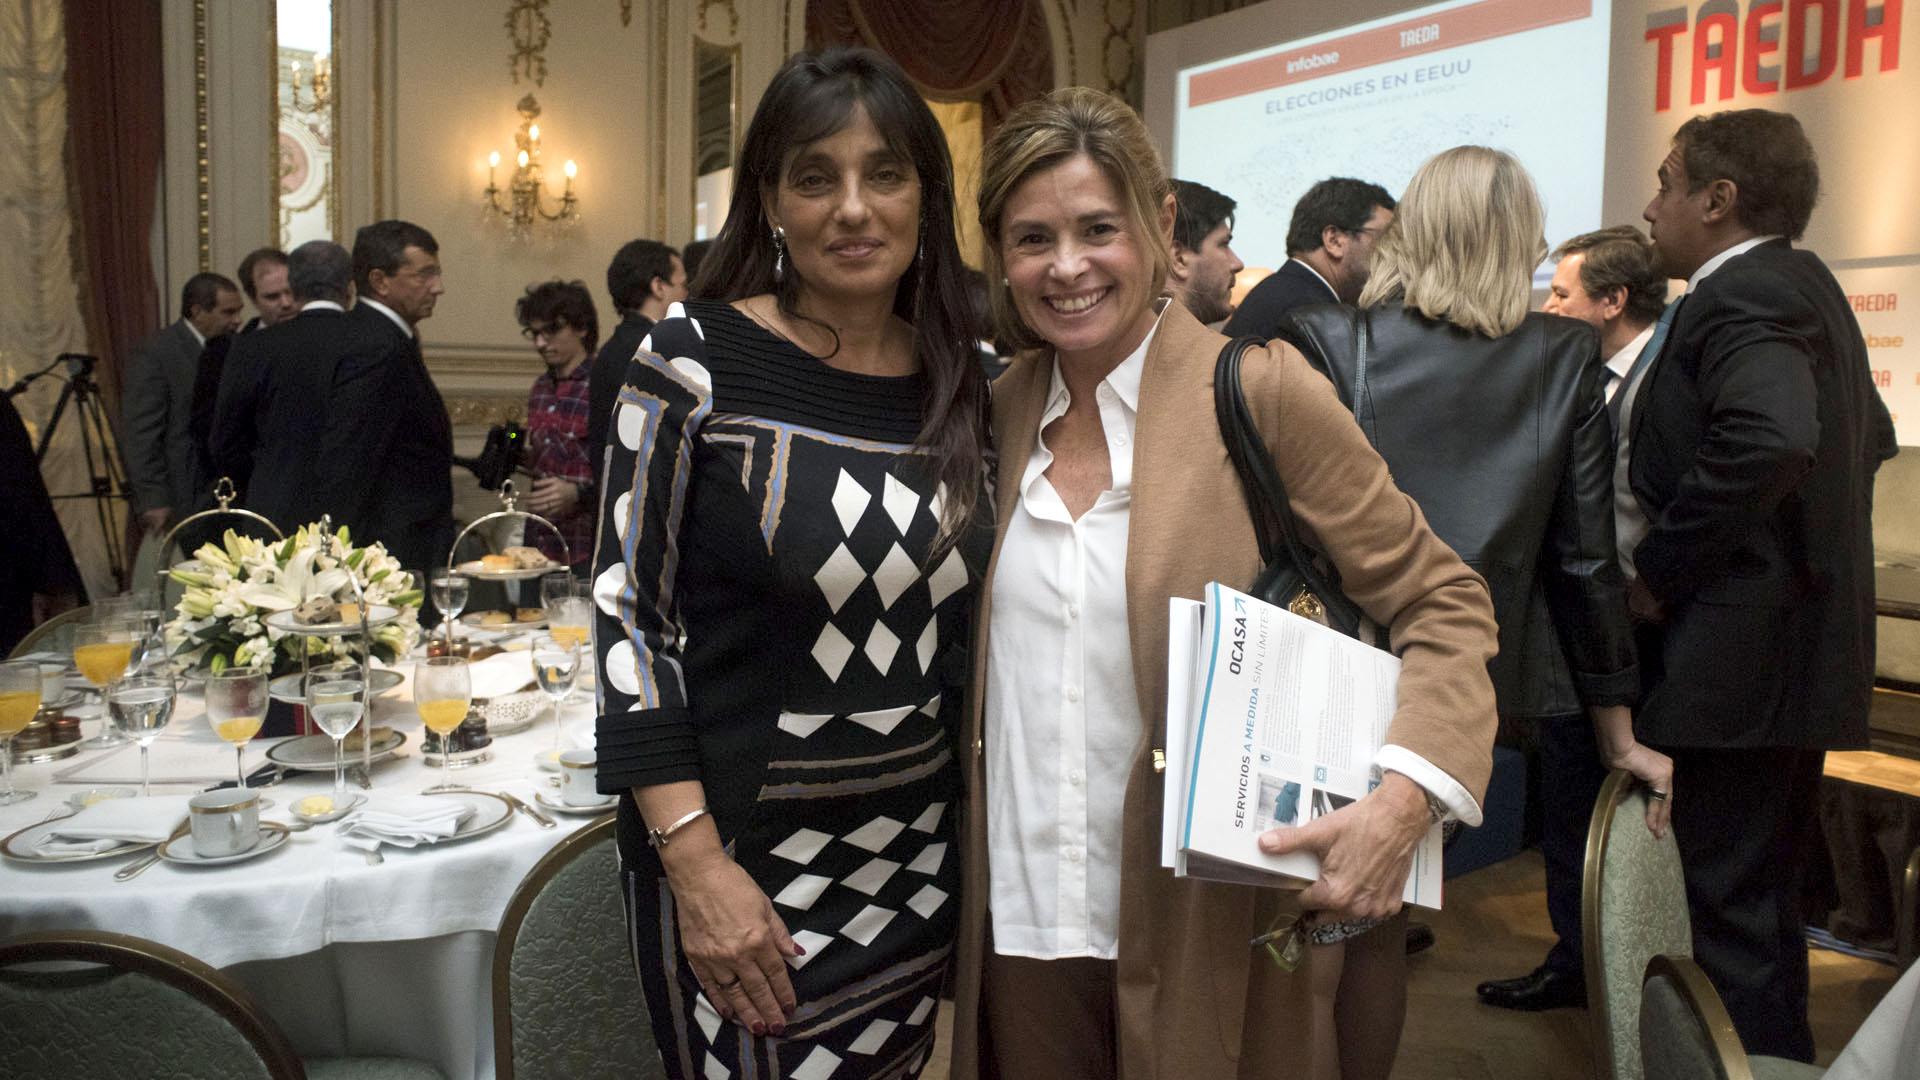 Viviana Zocco y María Laura Leguizamón